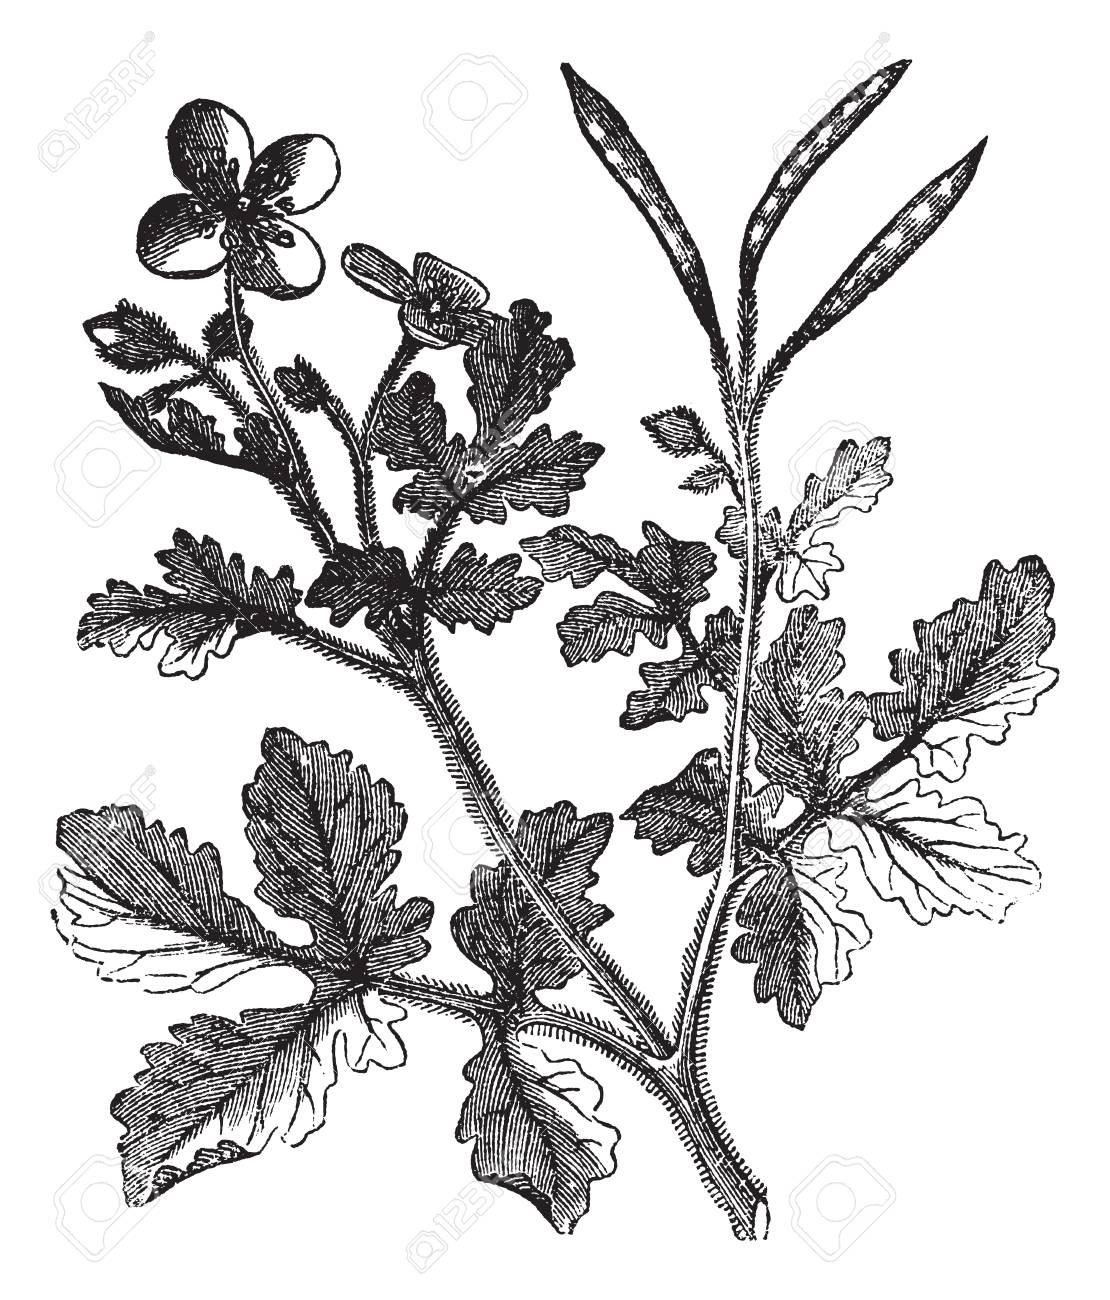 Greater Celandine or Tetterwort or Bloodroot or Chelidonium majus,